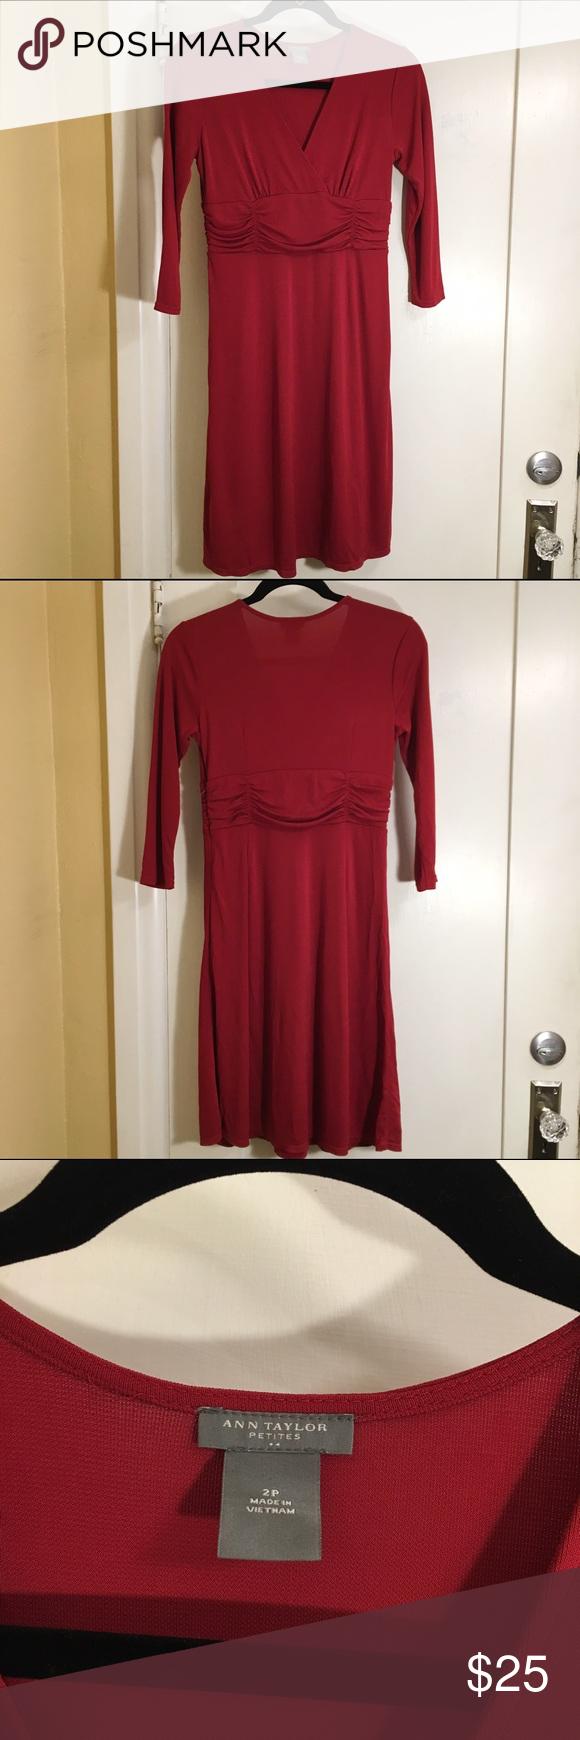 Must goann taylor long sleeve dress sleeved dress